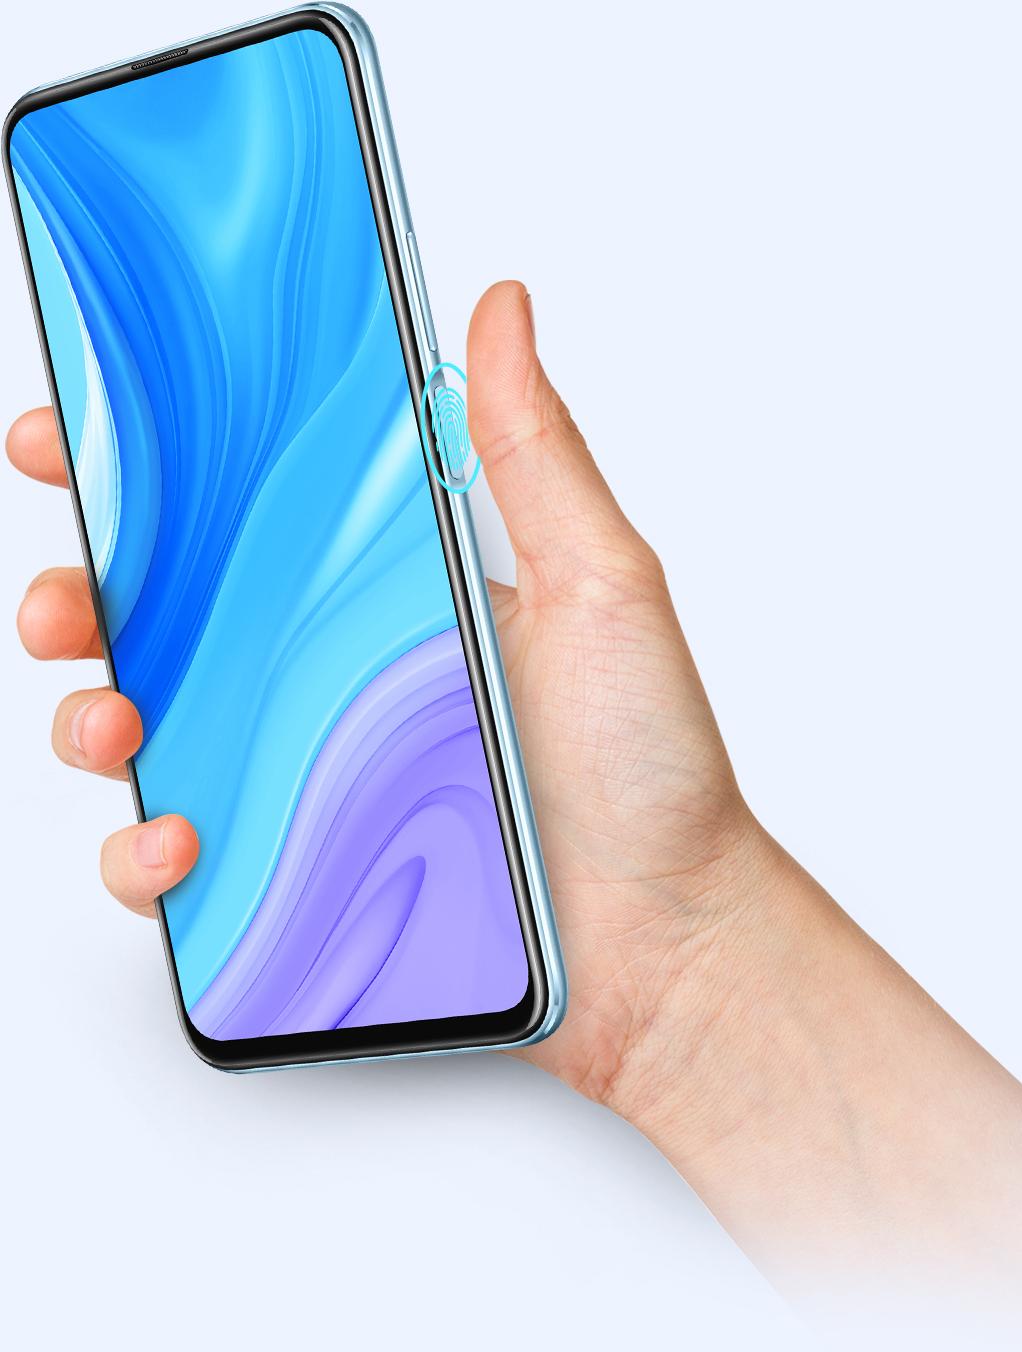 Huawei y9s fingerprint